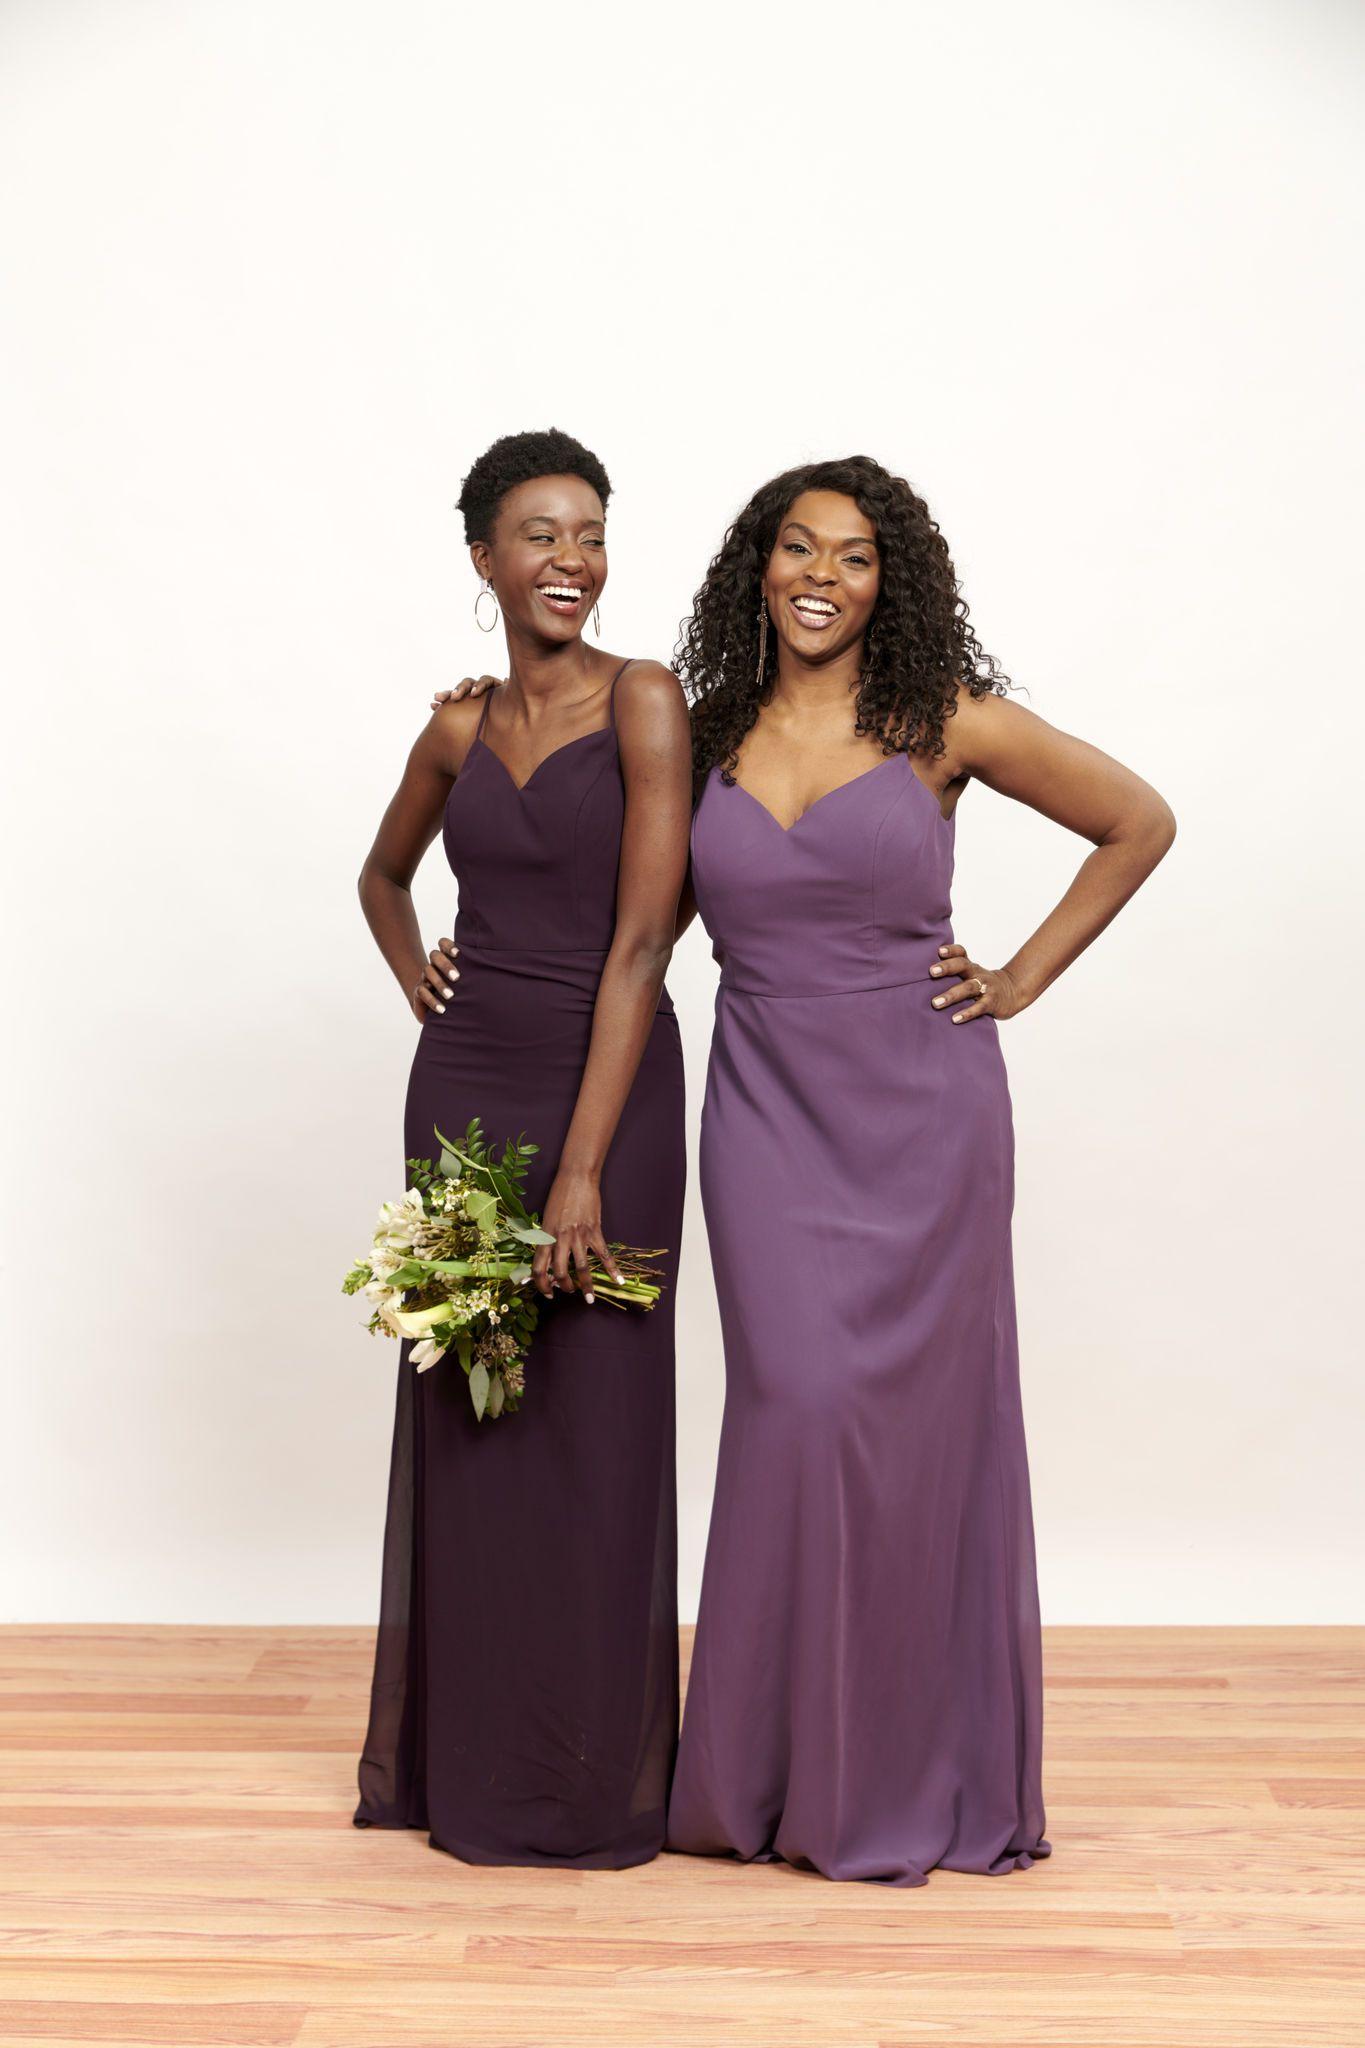 Looking For Purple Wedding Inspiration These Dark Purple Bridesmaid Dresses Give Us Ma Dark Purple Bridesmaid Dresses Bridesmaid Dresses Wedding Colors Purple,Wedding Dress Designs For Girls Kids